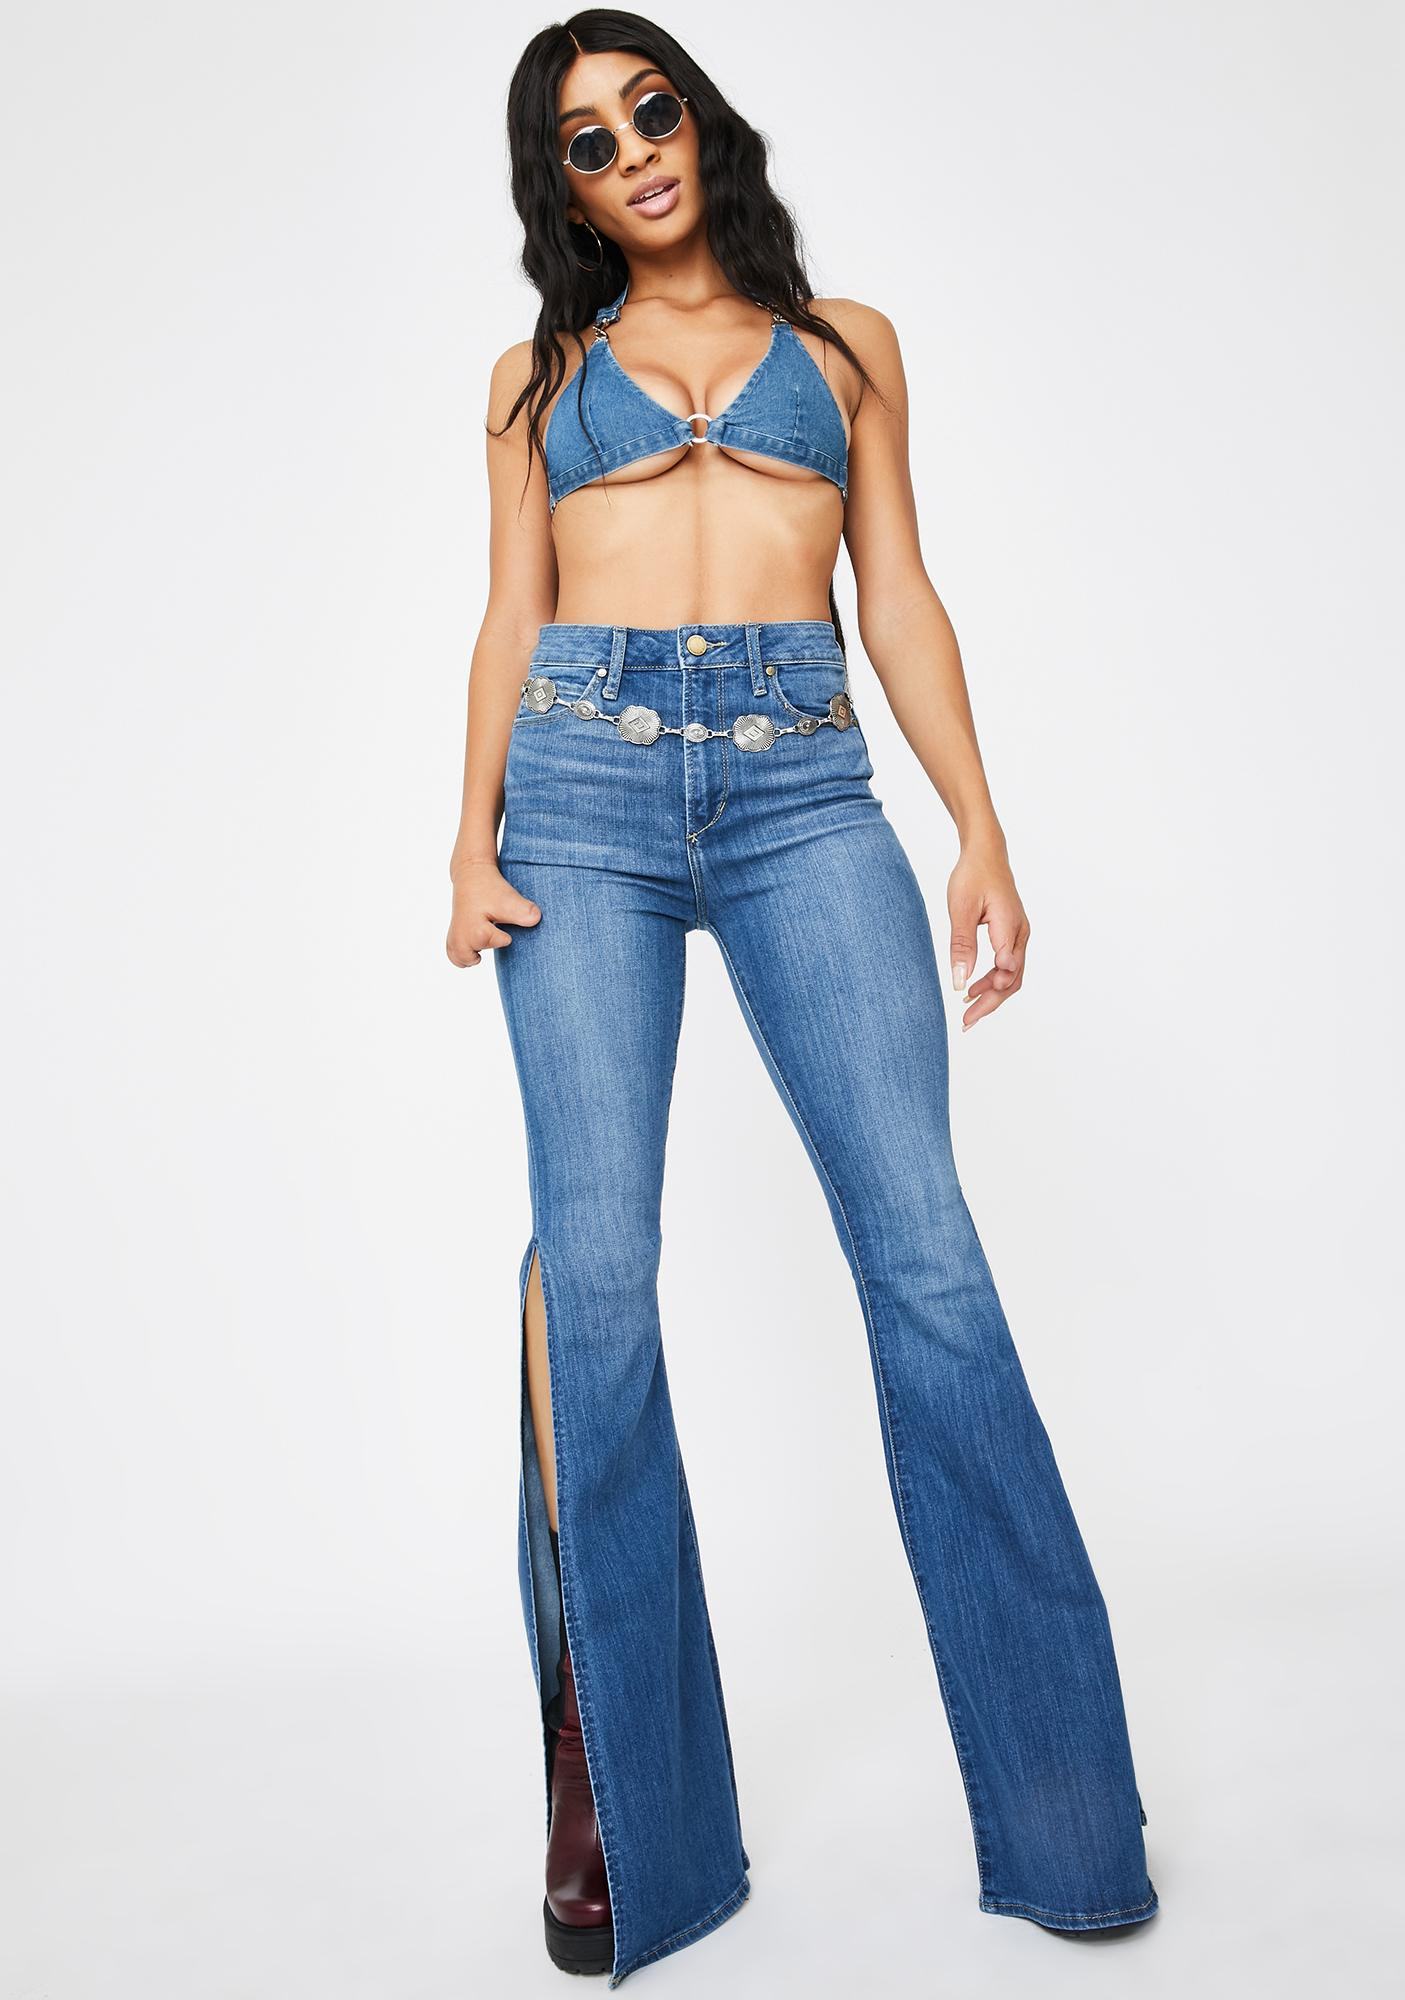 Articles Of Society Bridgette Flare Split Hem Denim Jeans Dolls Kill